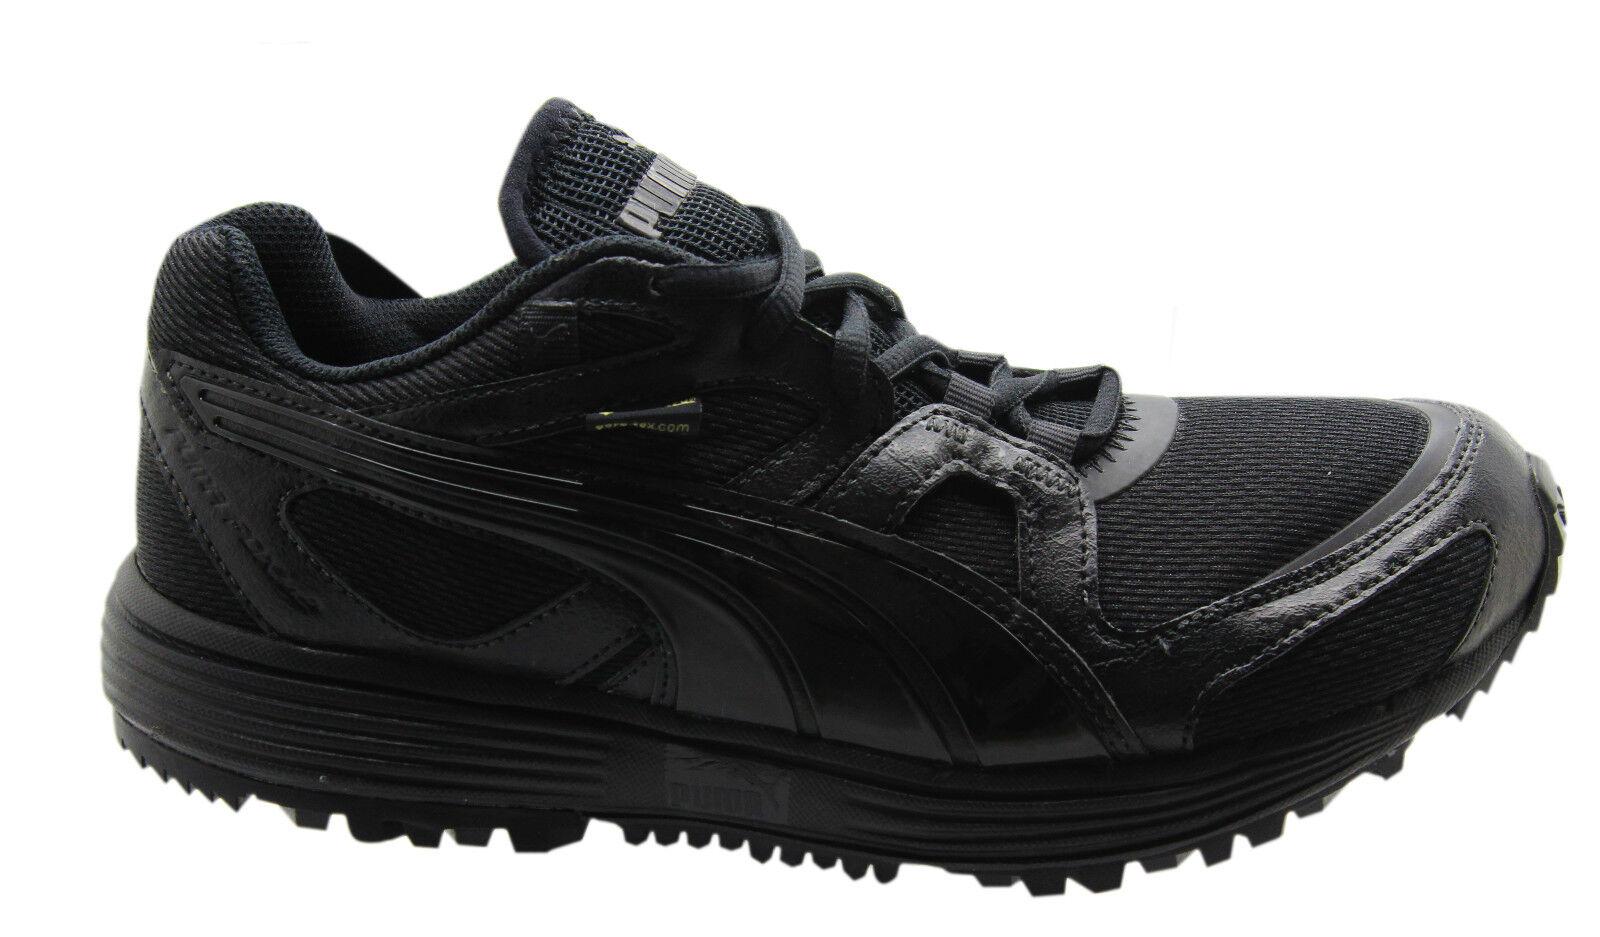 Puma Pumafox V2 Gortex   Herren Mesh Lace Up Running Schuhes (186746 04 - U65)